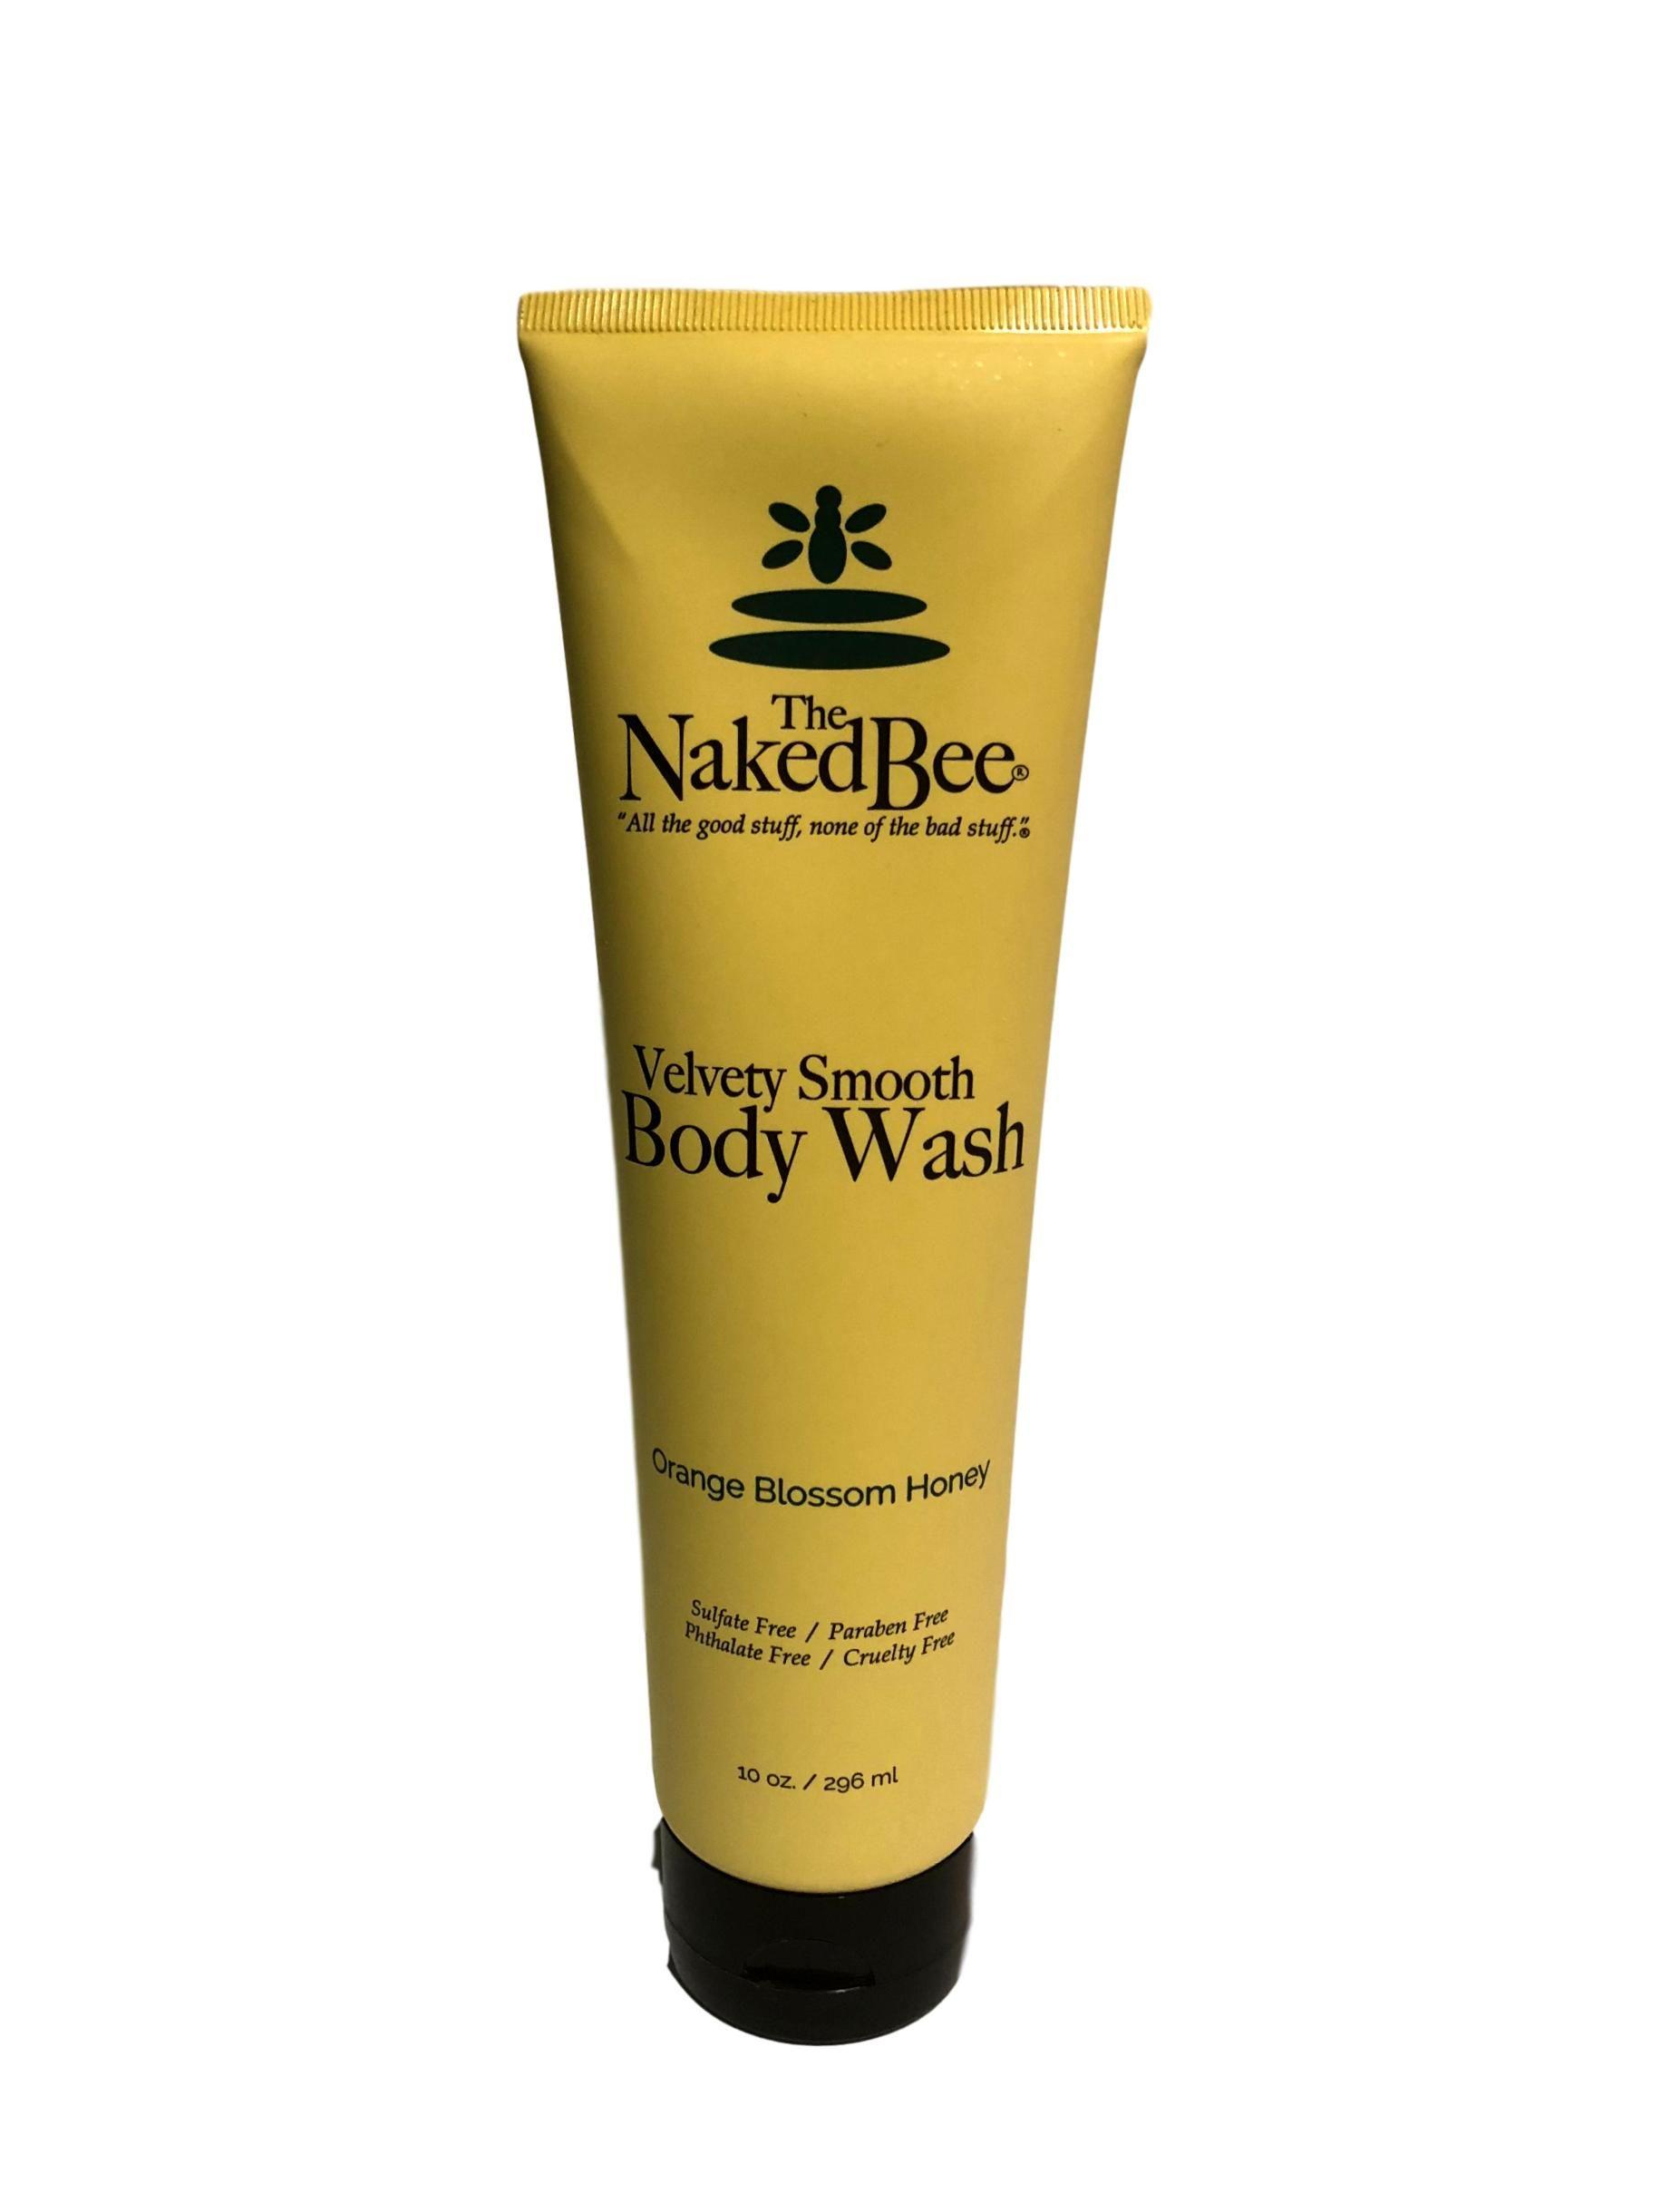 Amazon.com: The Naked Bee - Orange Blossom Honey Body Wash